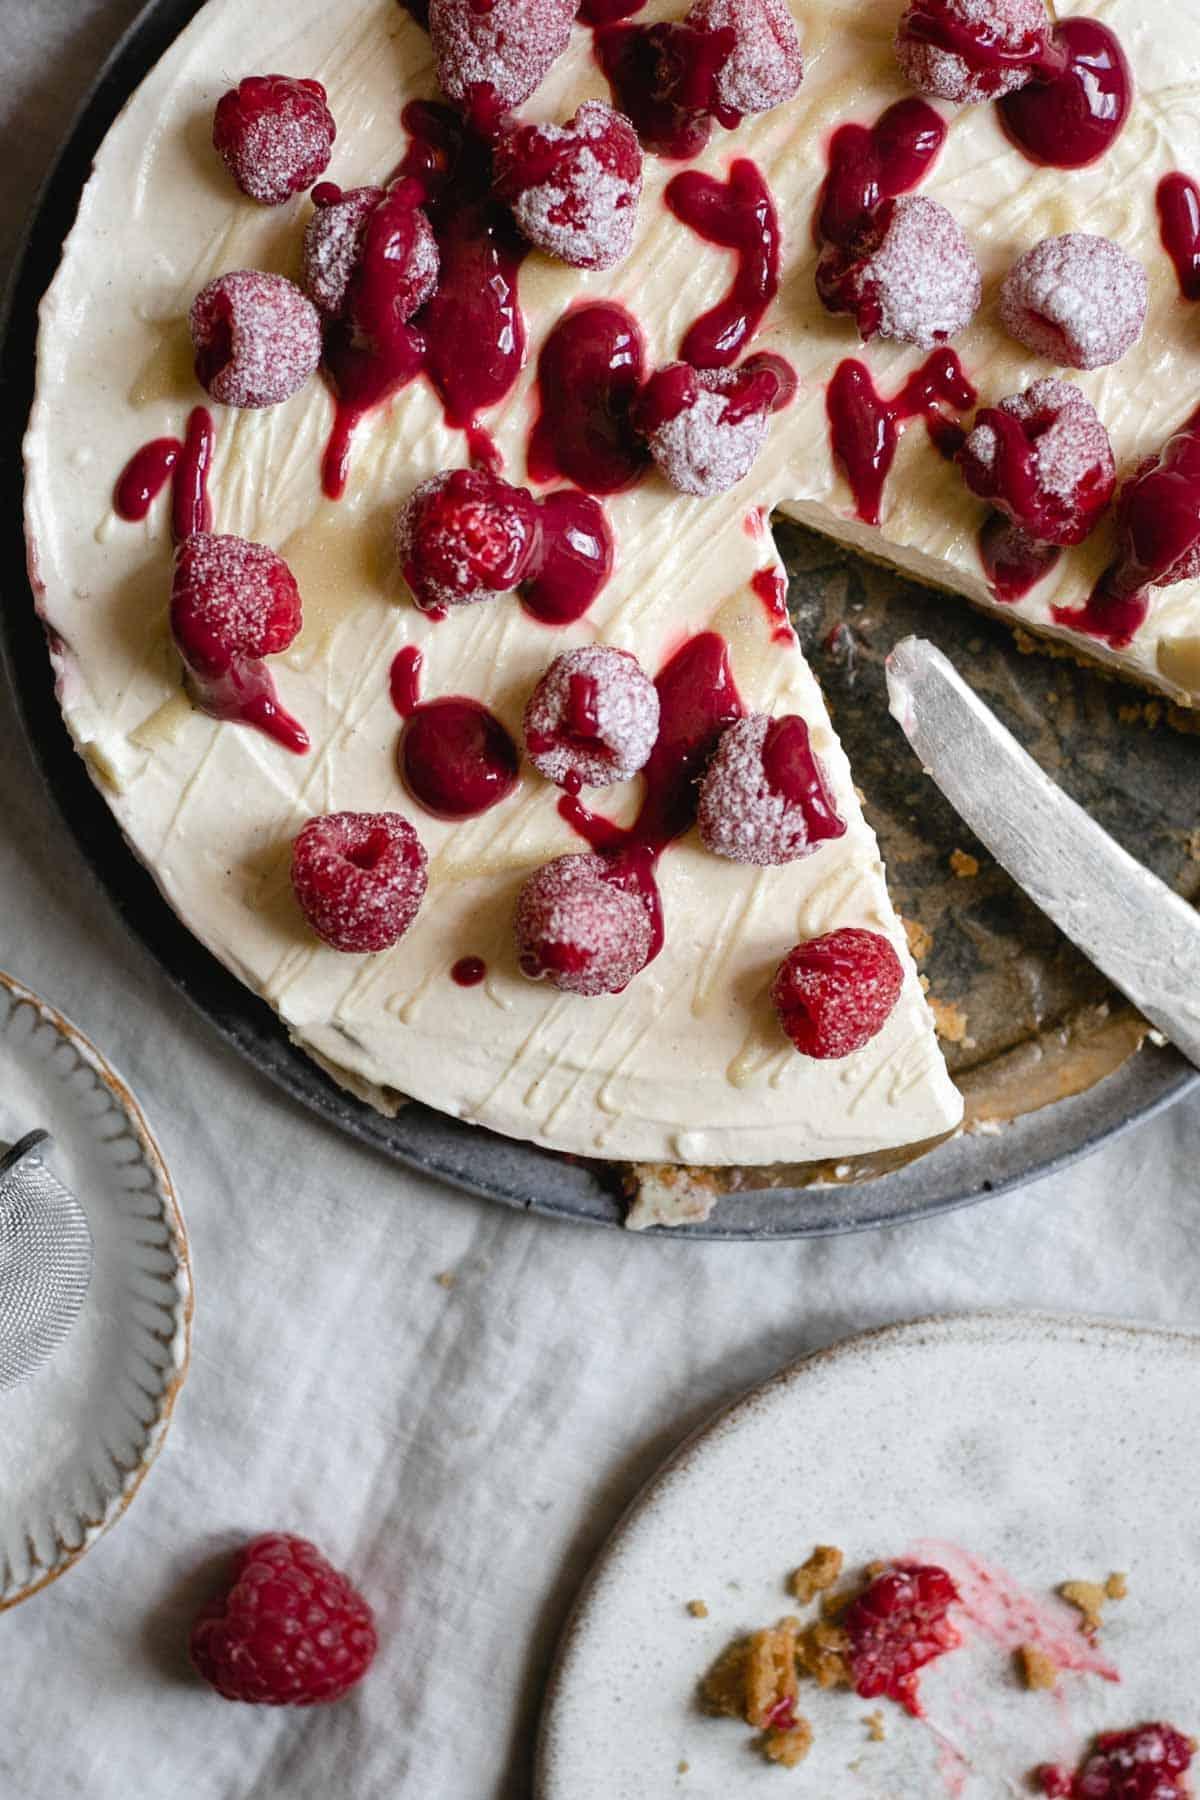 Smooth and creamy no-bake raspberry cheesecake with white chocolate #nobake #dessert #cheesecake | via @annabanana.co